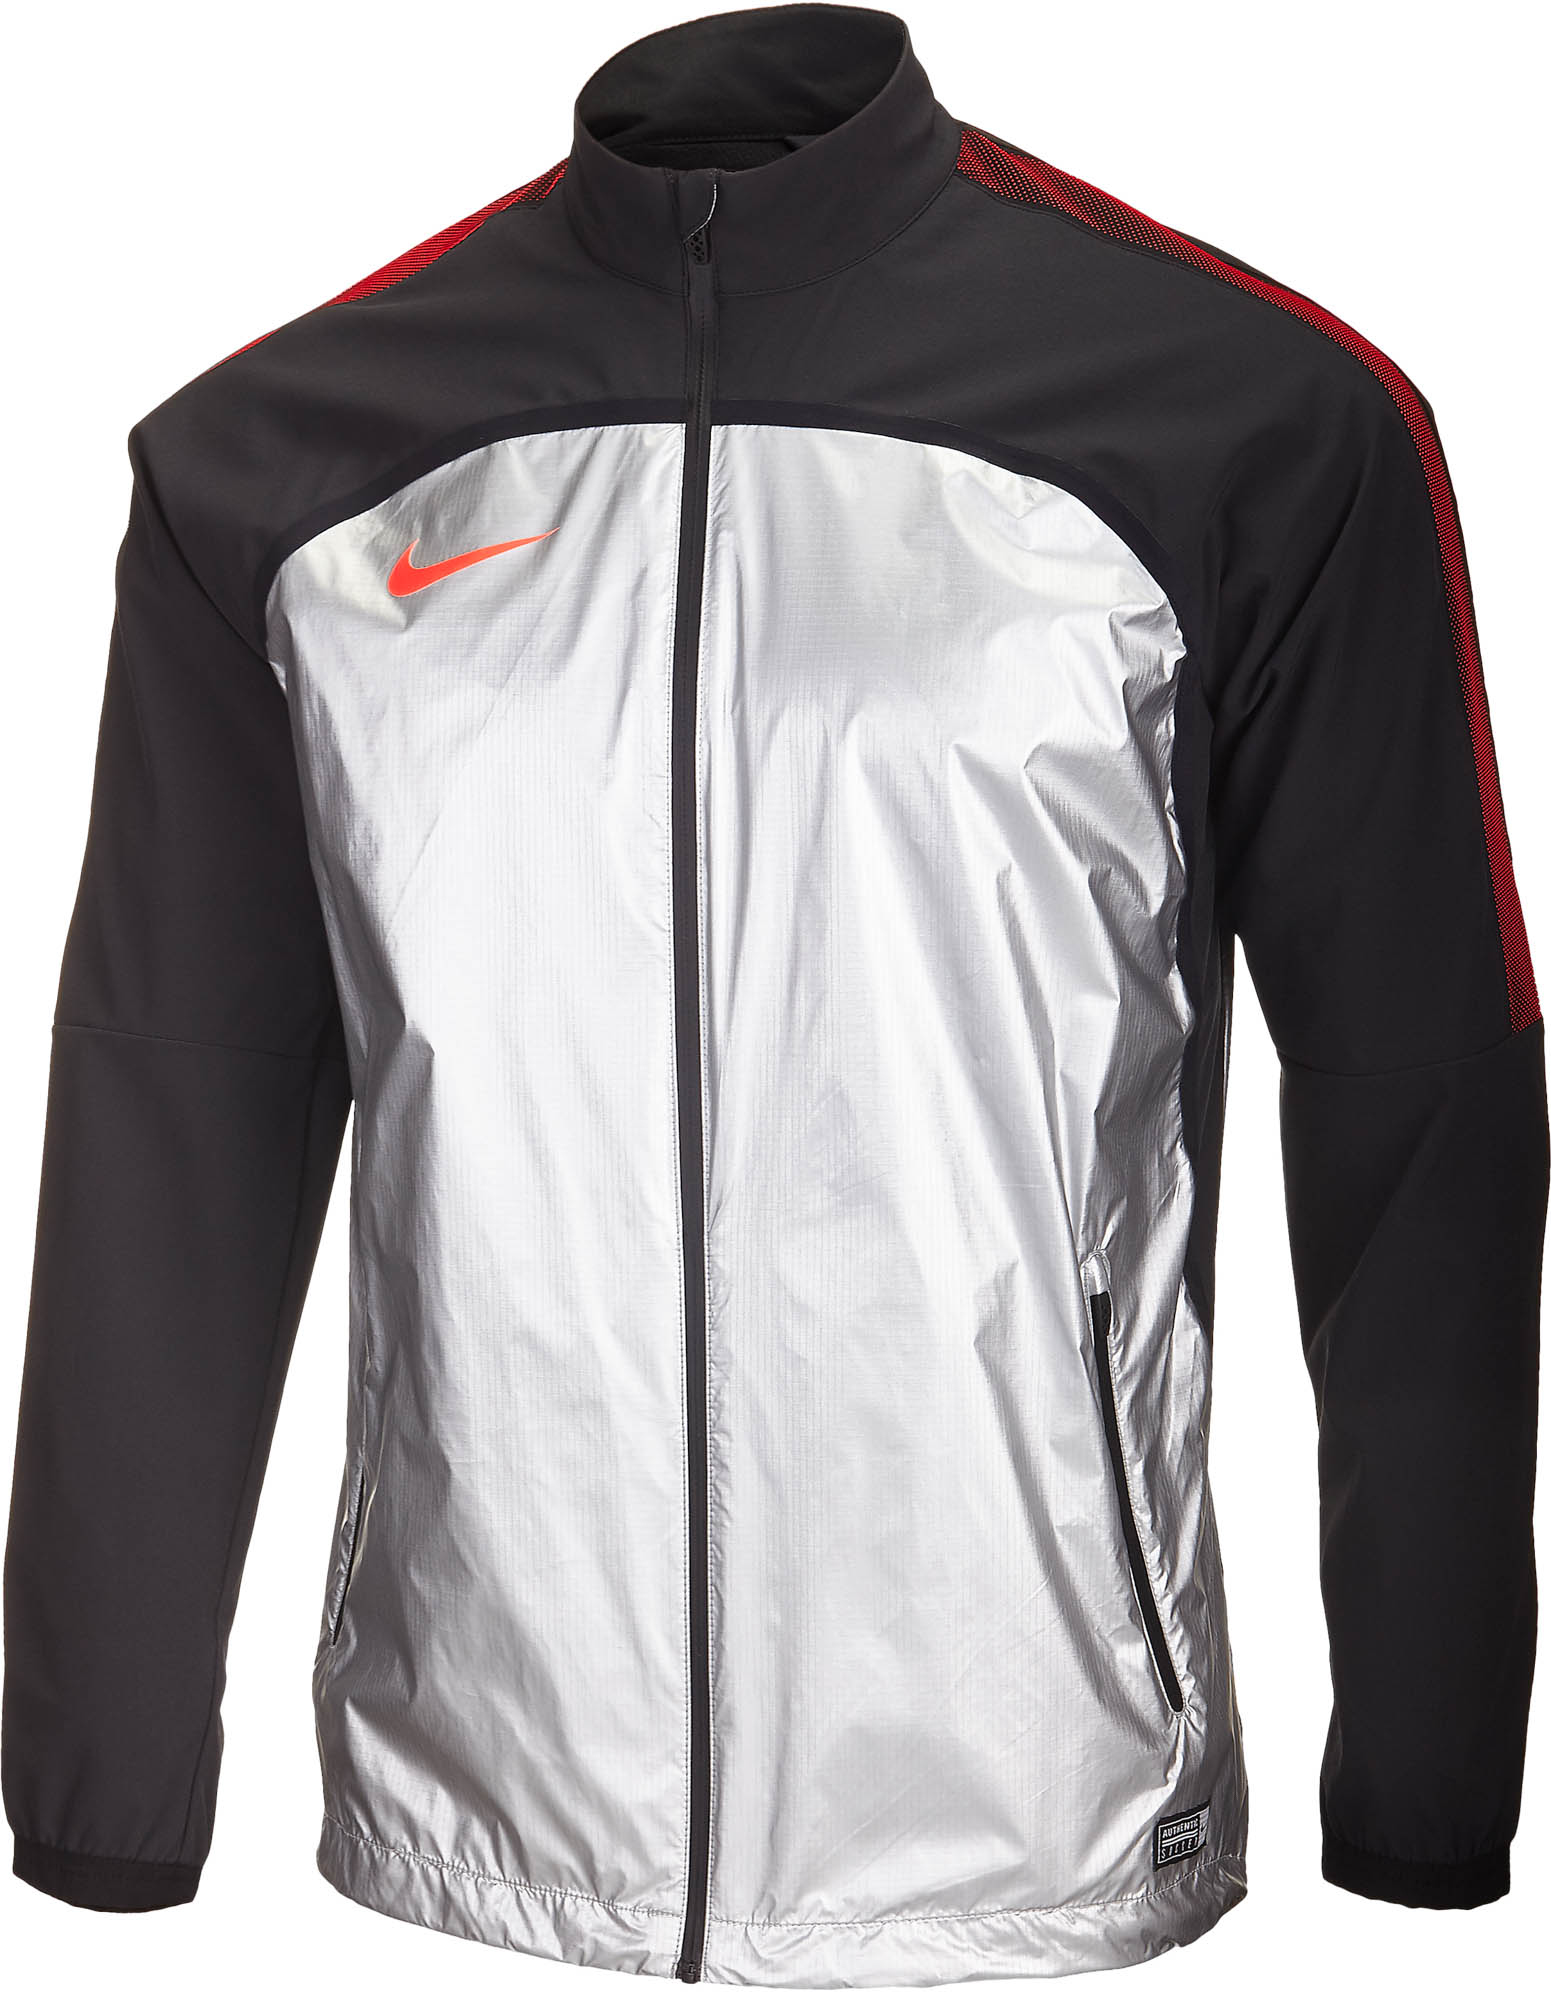 Nike Revolution Woven Elite Jacket II – Metallic SilverBlack